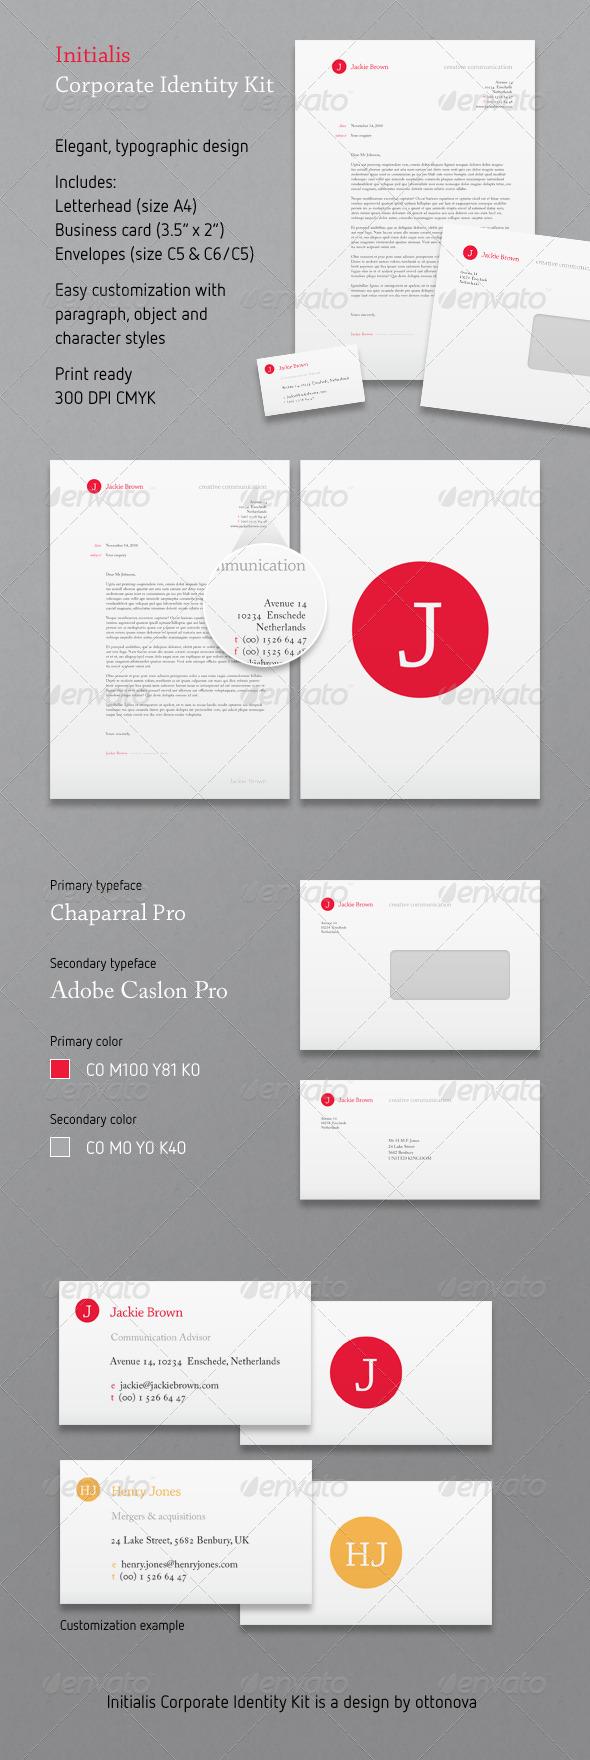 GraphicRiver Initialis Corporate Identity Kit 156052